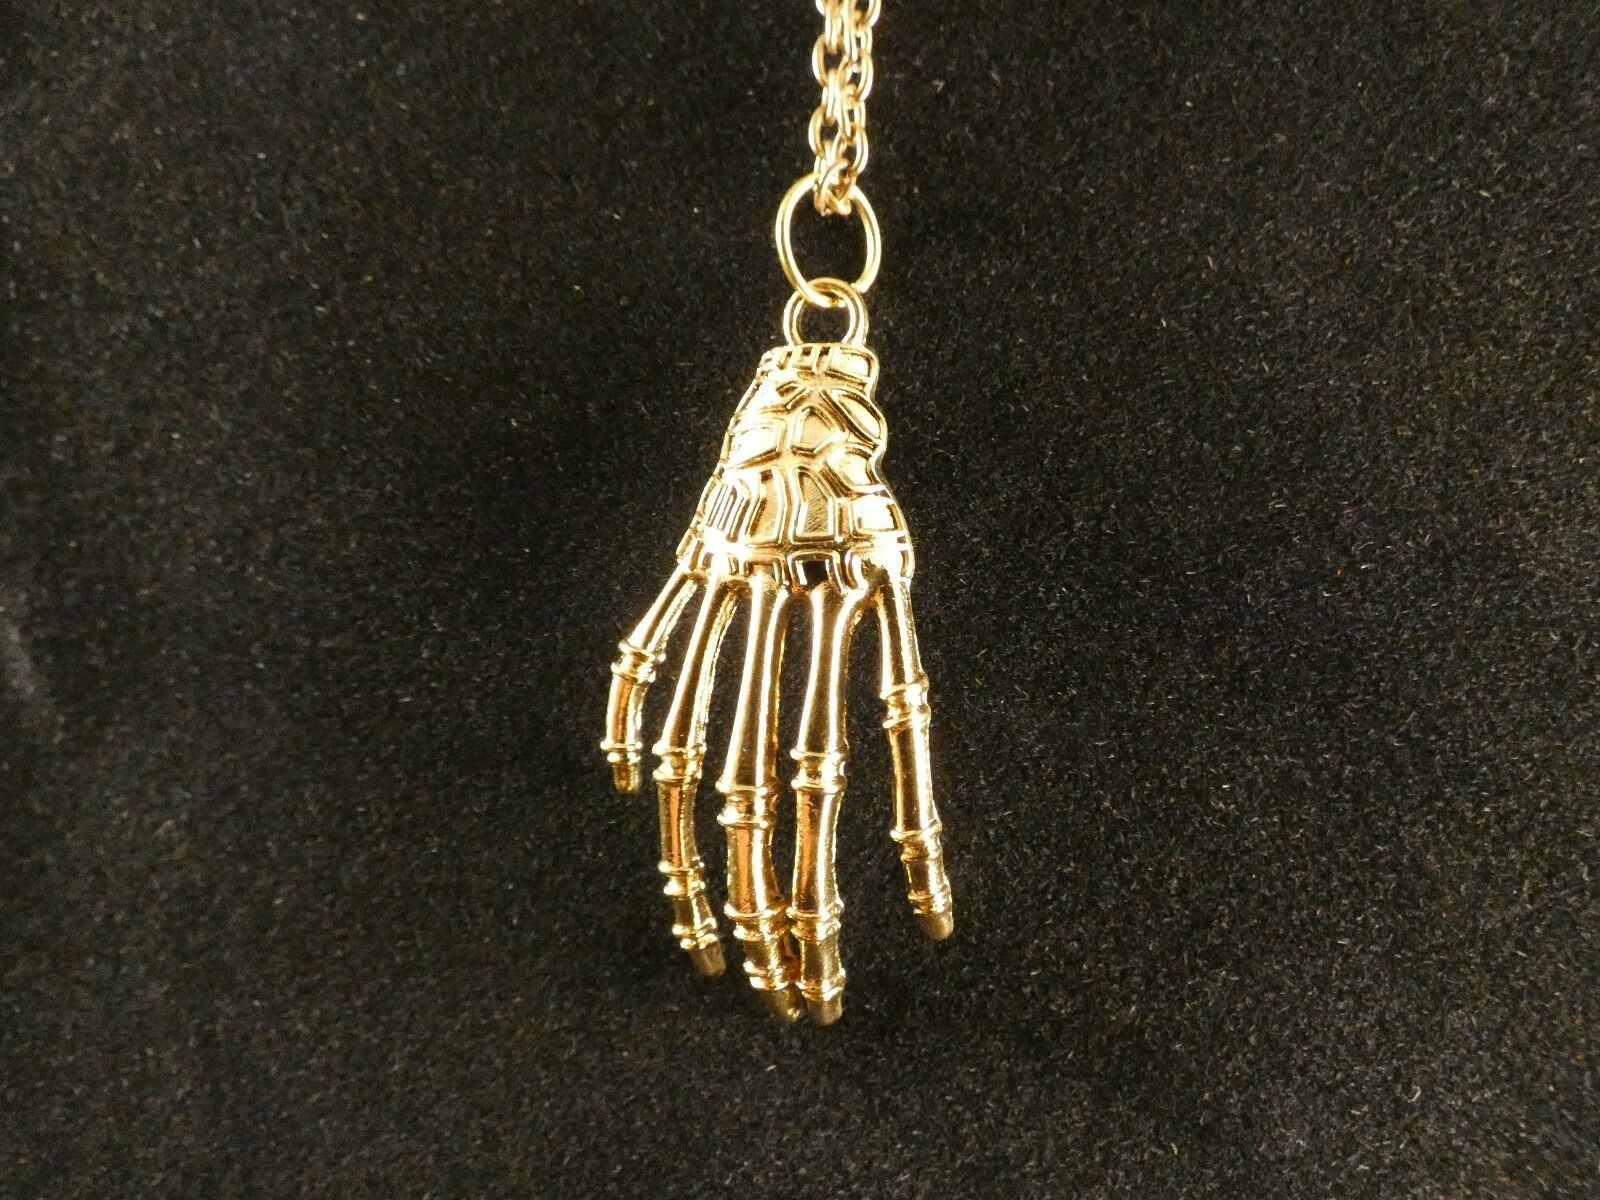 Hand Halskette 24 Karat Vergoldet Skelett Knochen Gothic Punk Snap Chunk